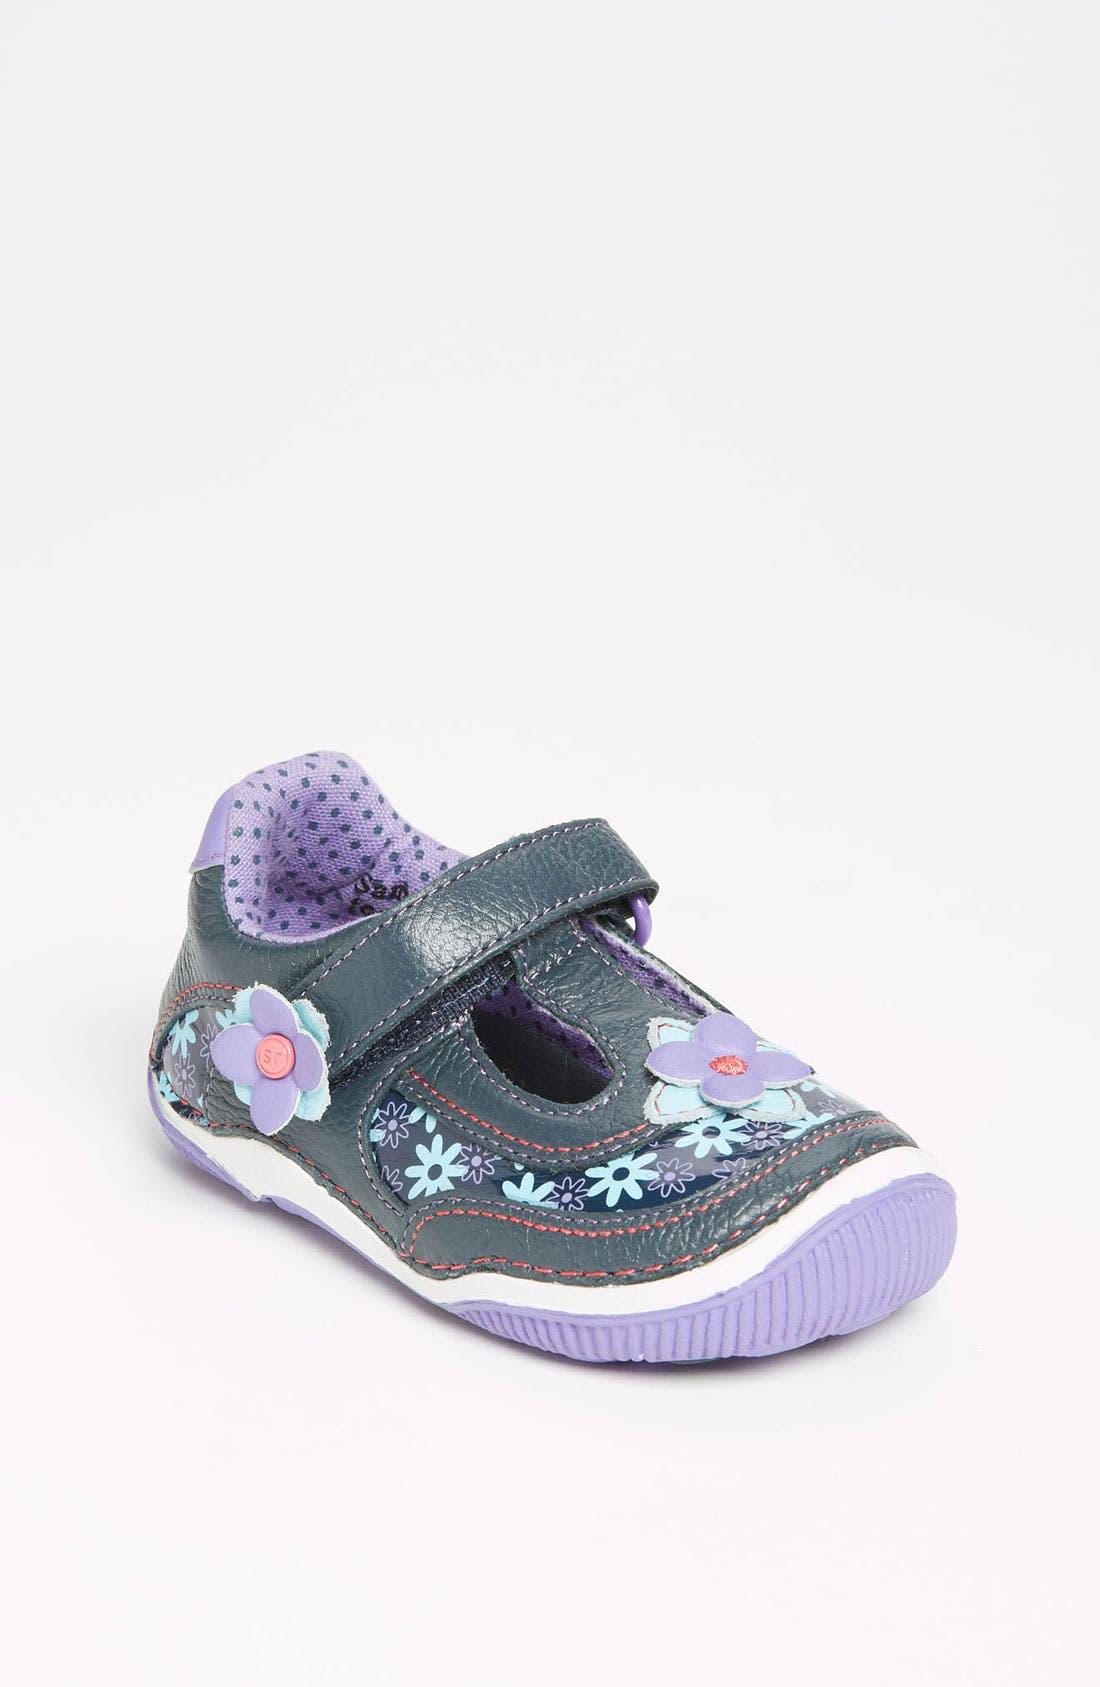 Alternate Image 1 Selected - Stride Rite 'Rain' Sneaker (Baby, Walker & Toddler)